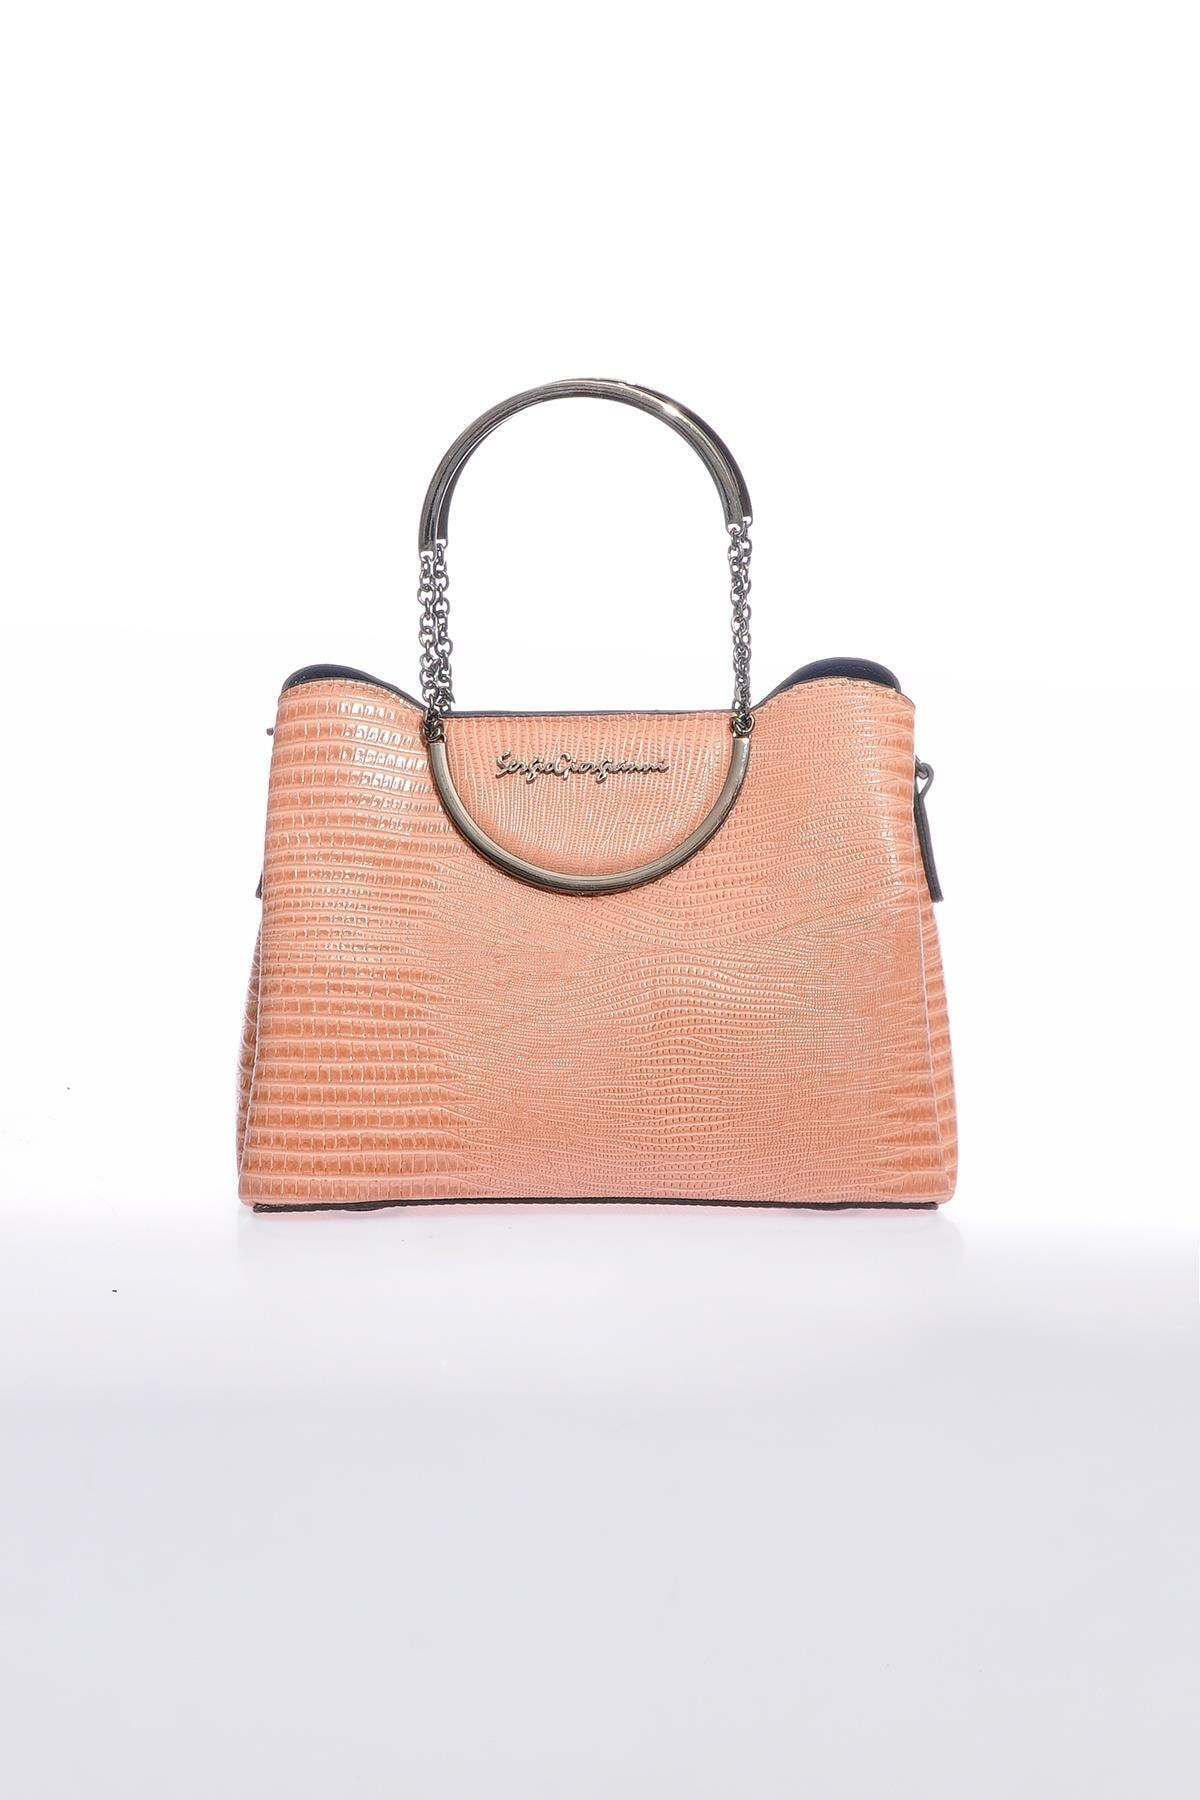 Sergio Giorgianni Luxury Sg0715 Pudra Kadın Omuz Çantası 1